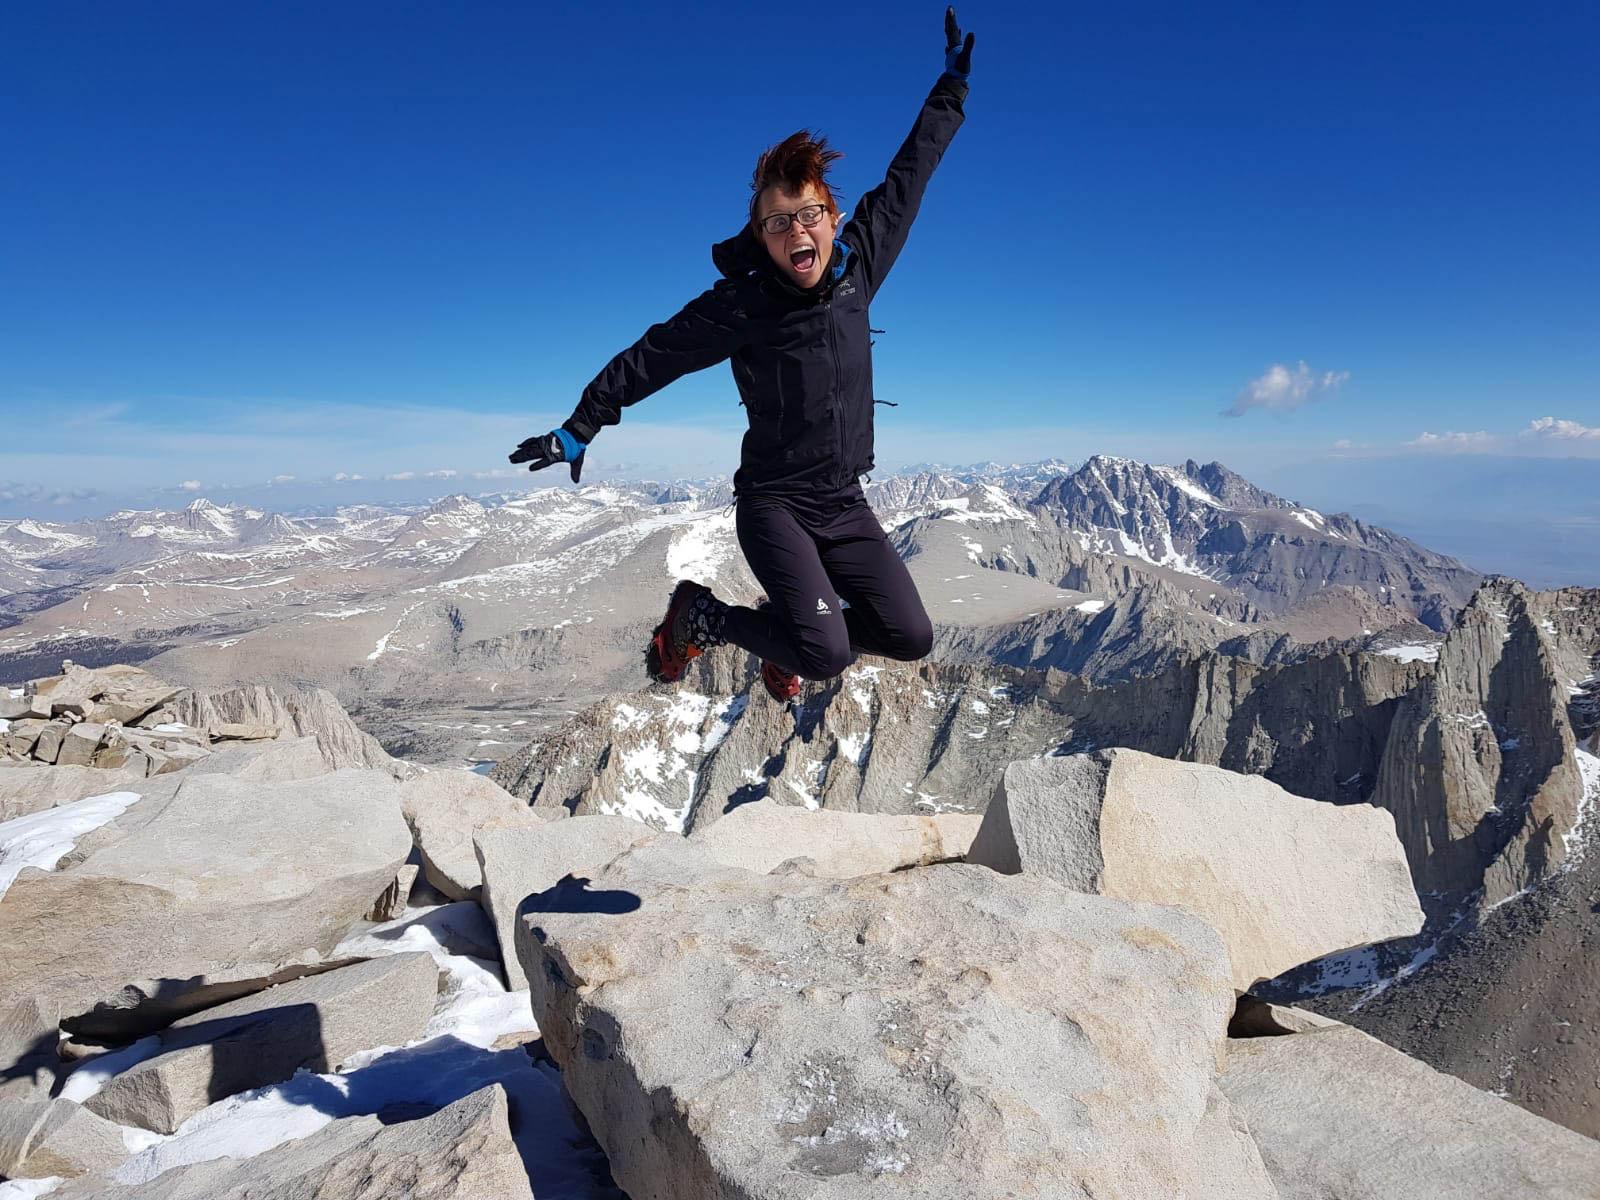 Pacific Crest Trail_Mount_Whitney_Sierra_Nevada